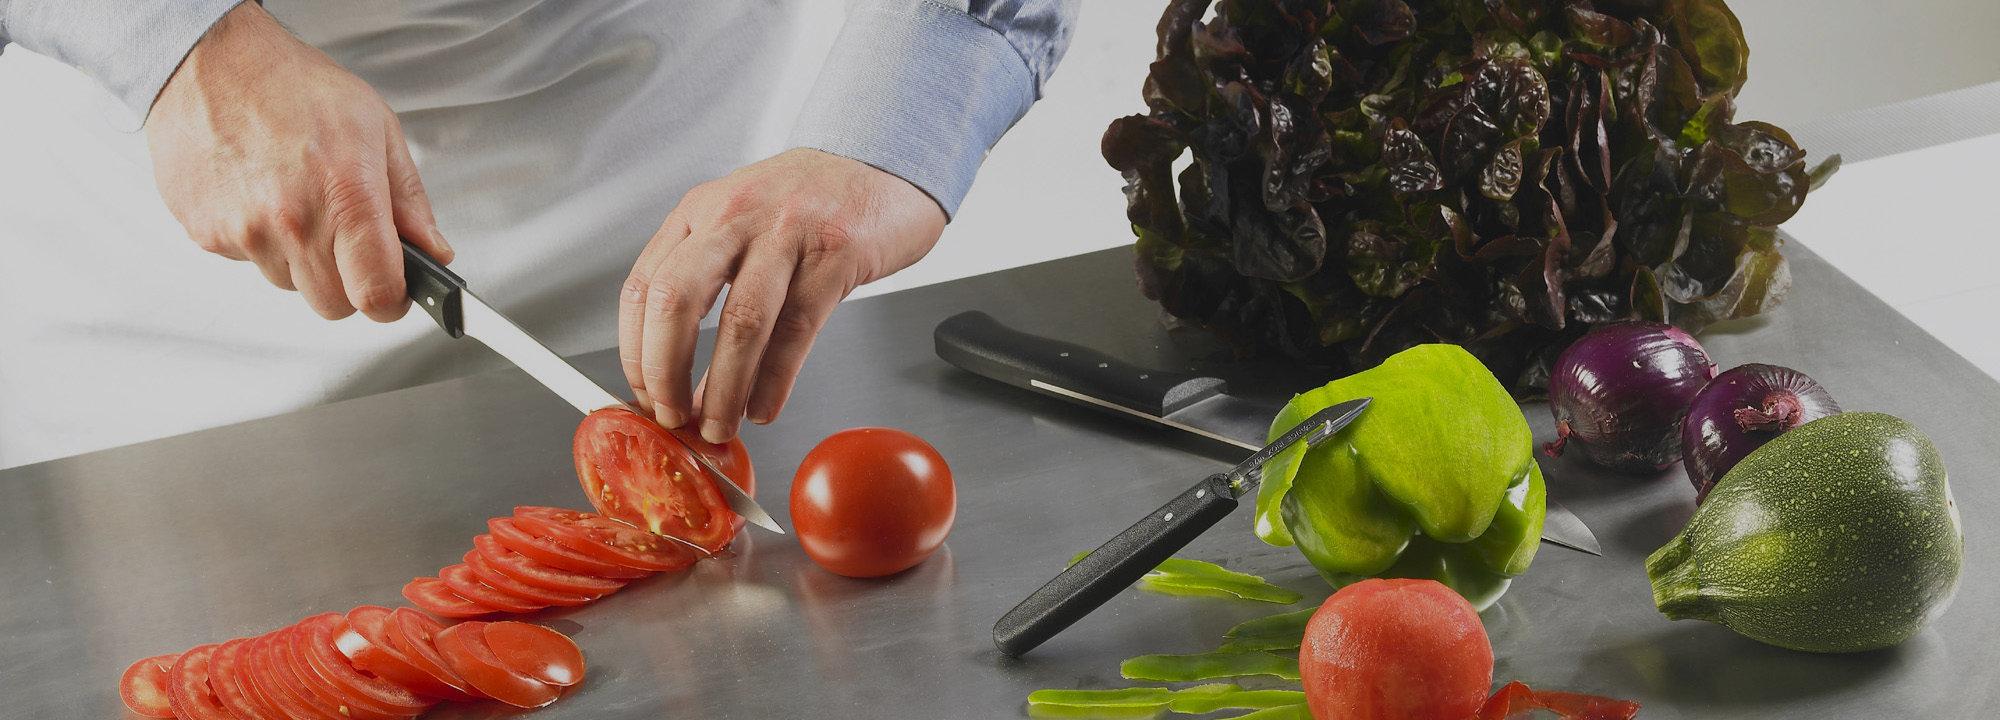 Couteau cuisine Gamme Expert Nogent